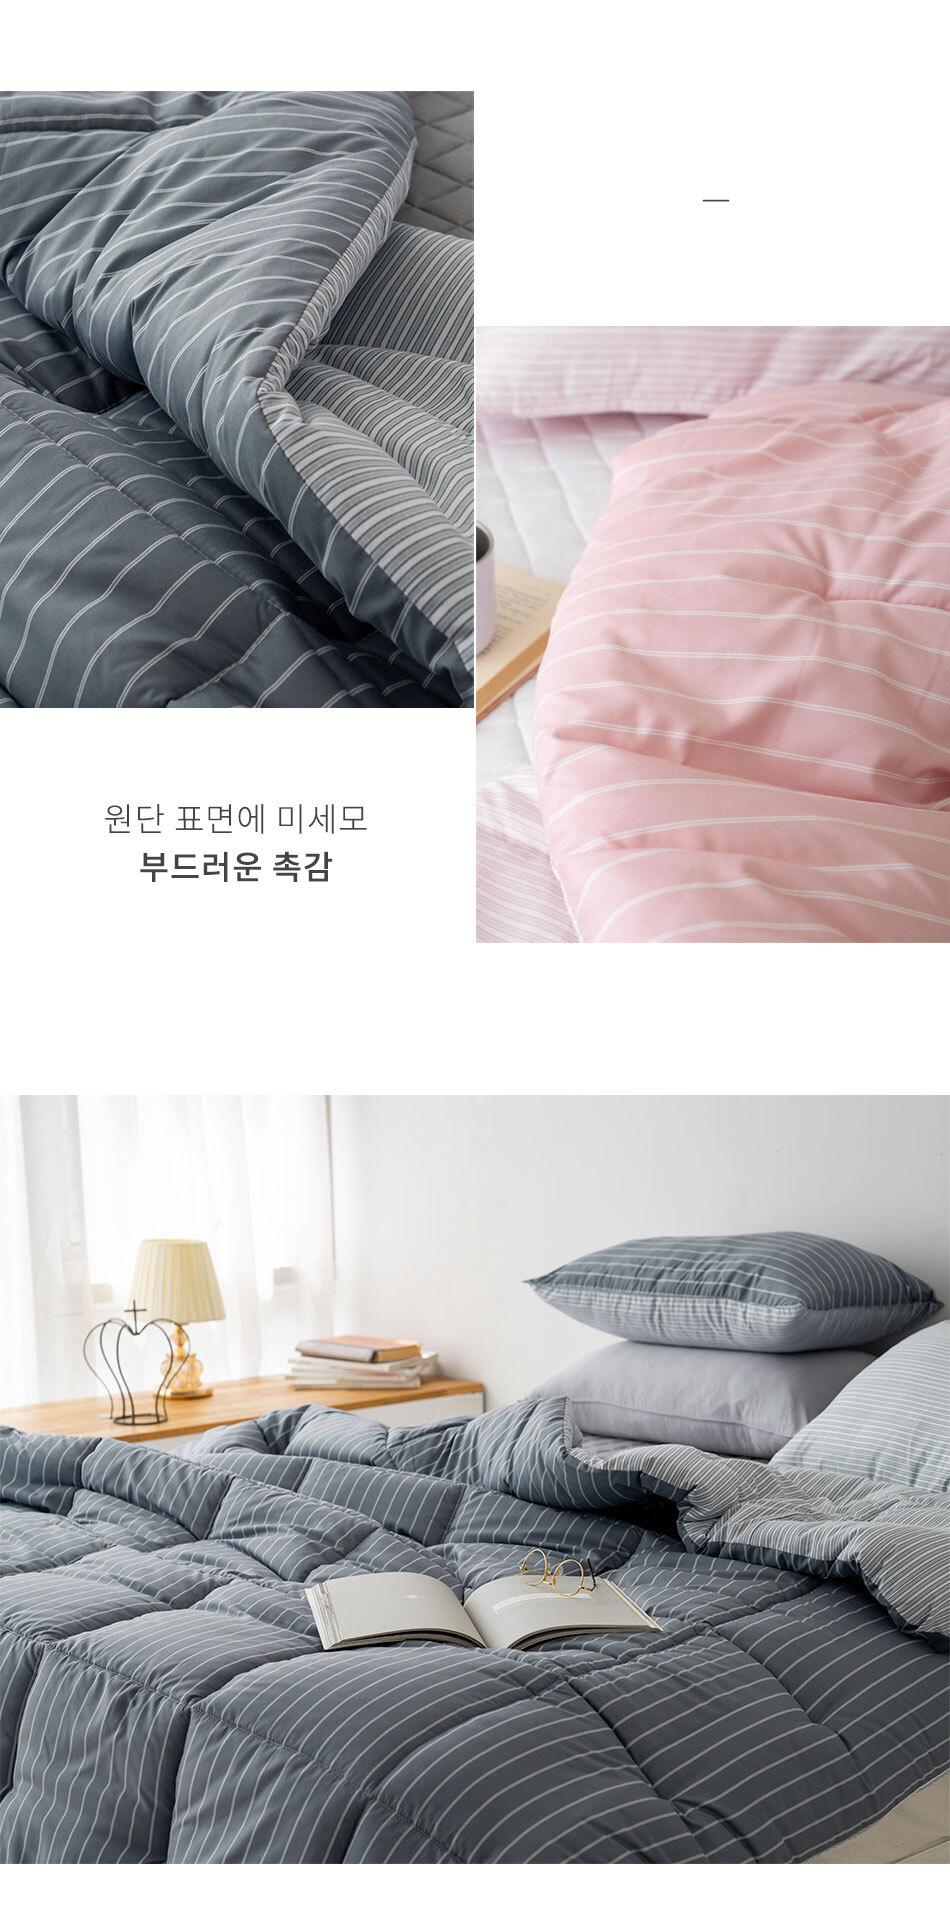 urban_bed_03.jpg